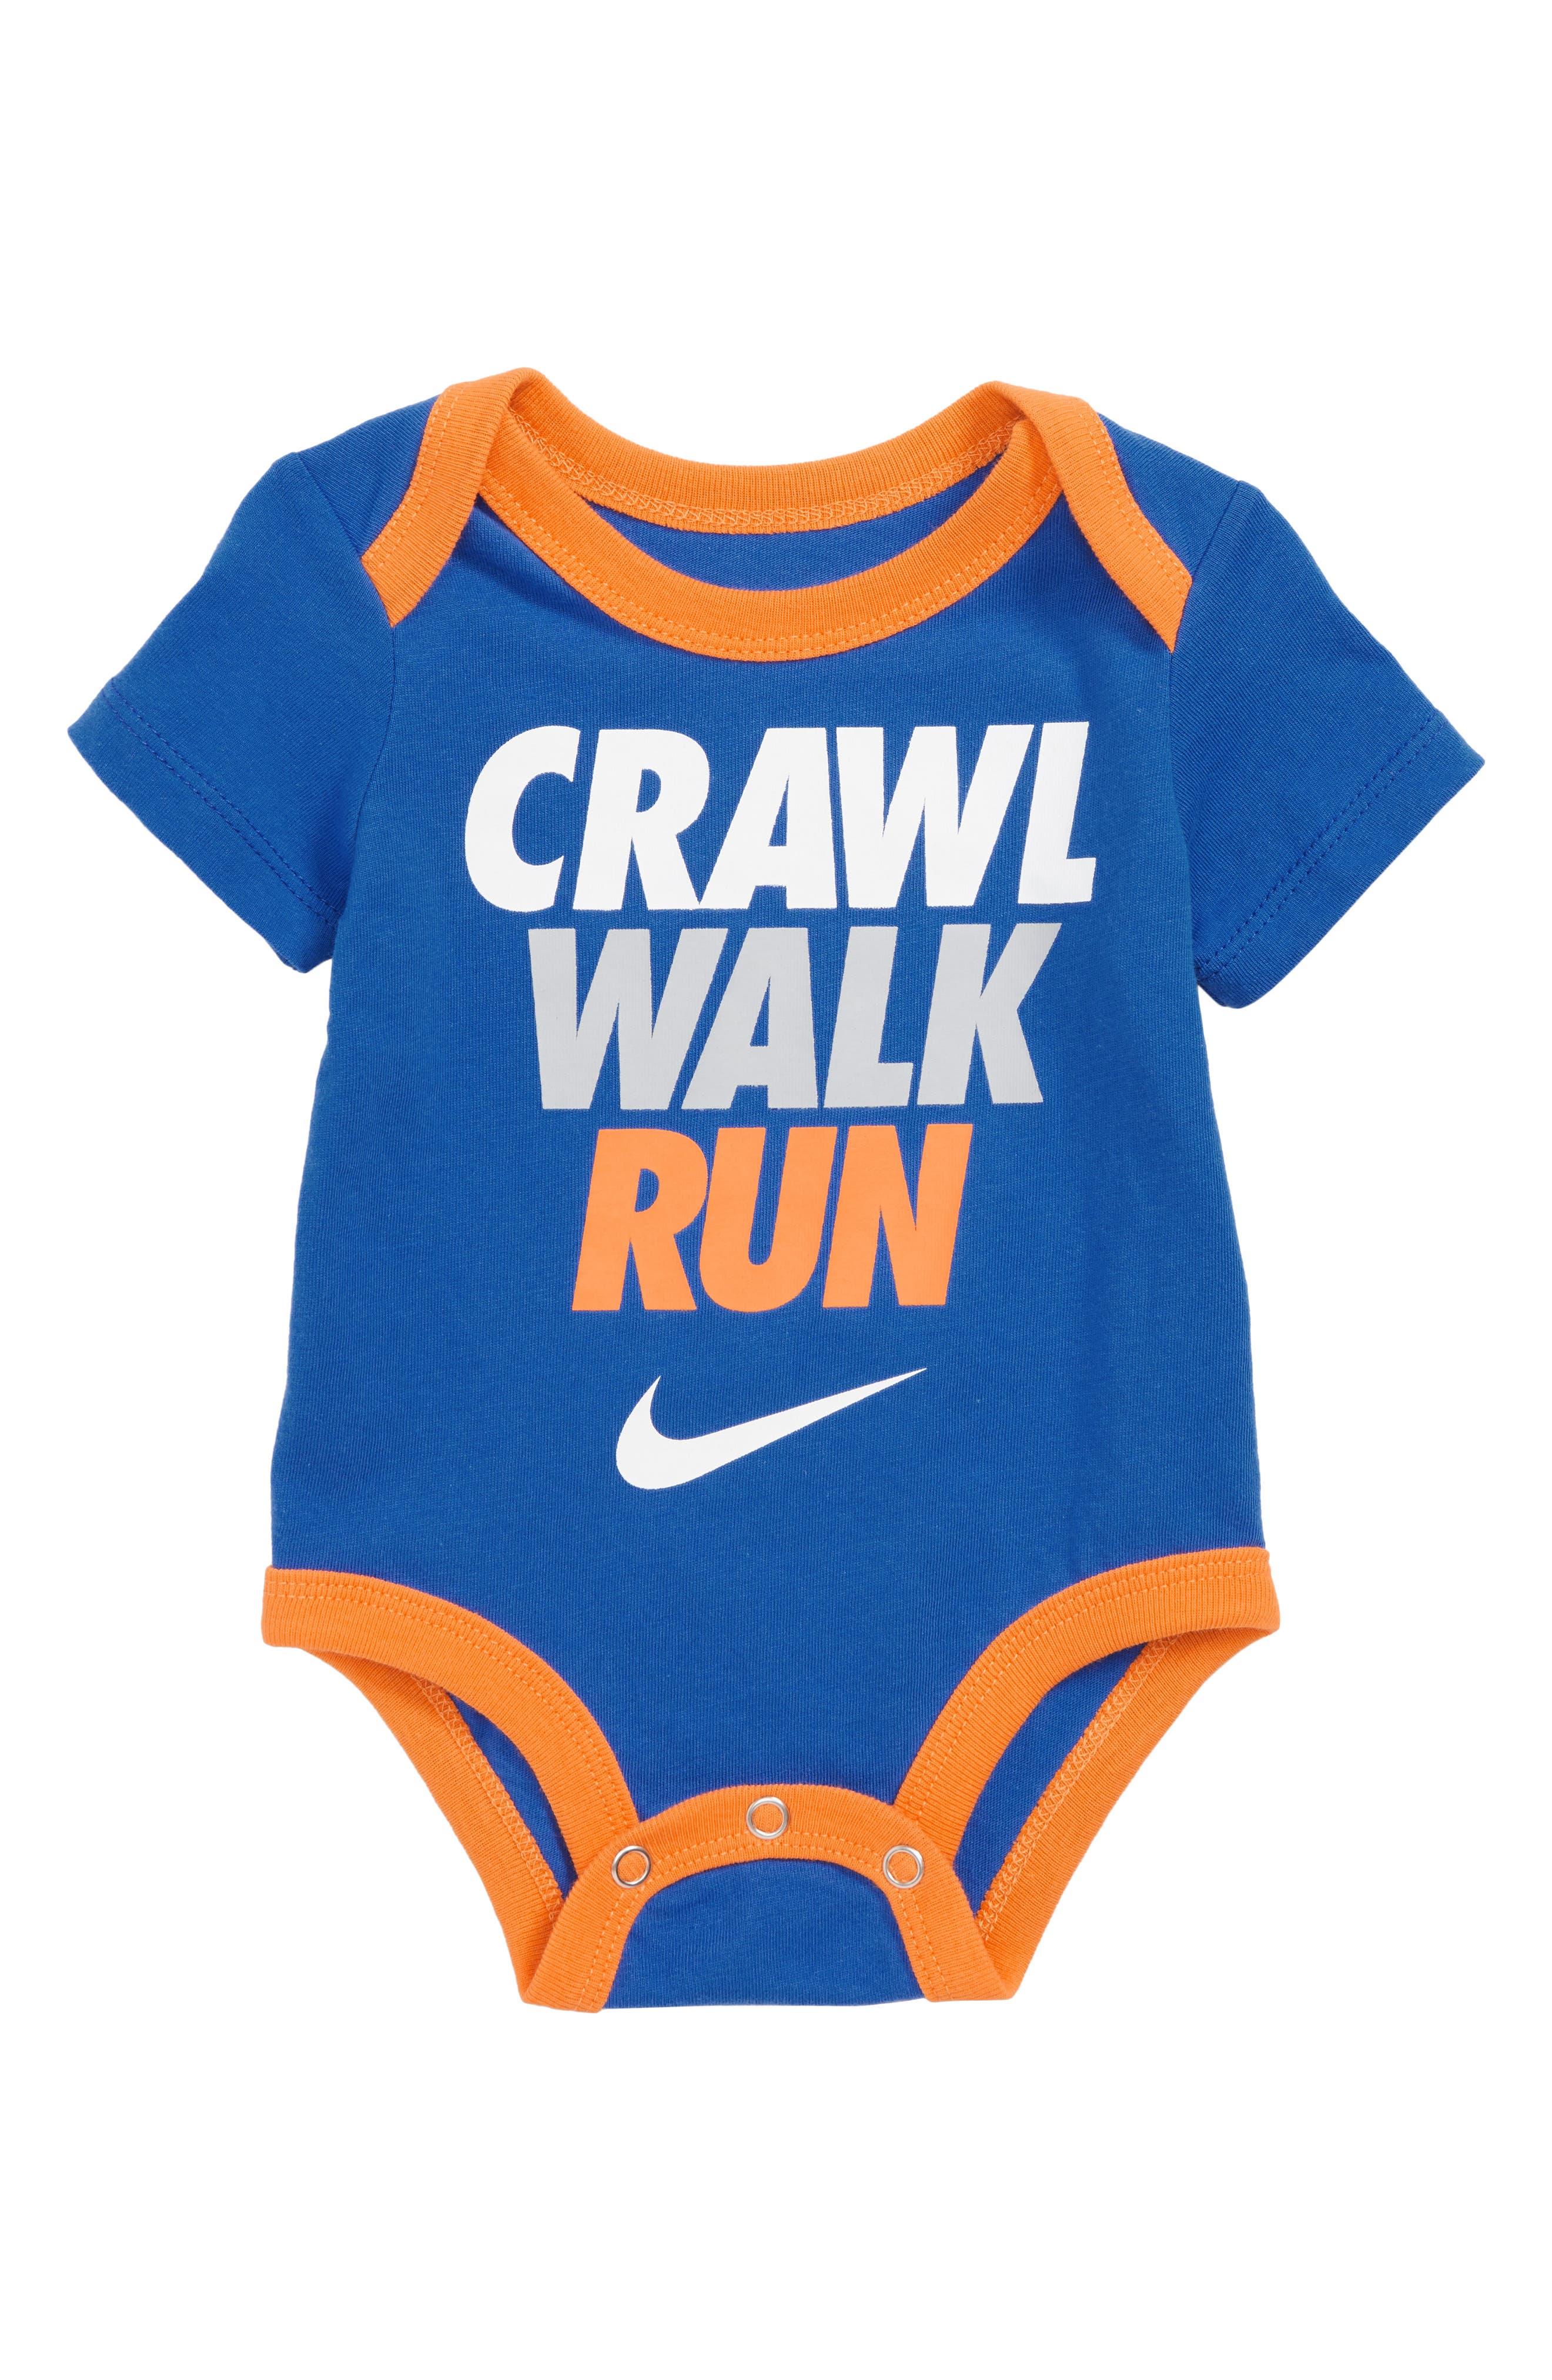 Crawl Walk Run Bodysuit,                             Main thumbnail 1, color,                             422